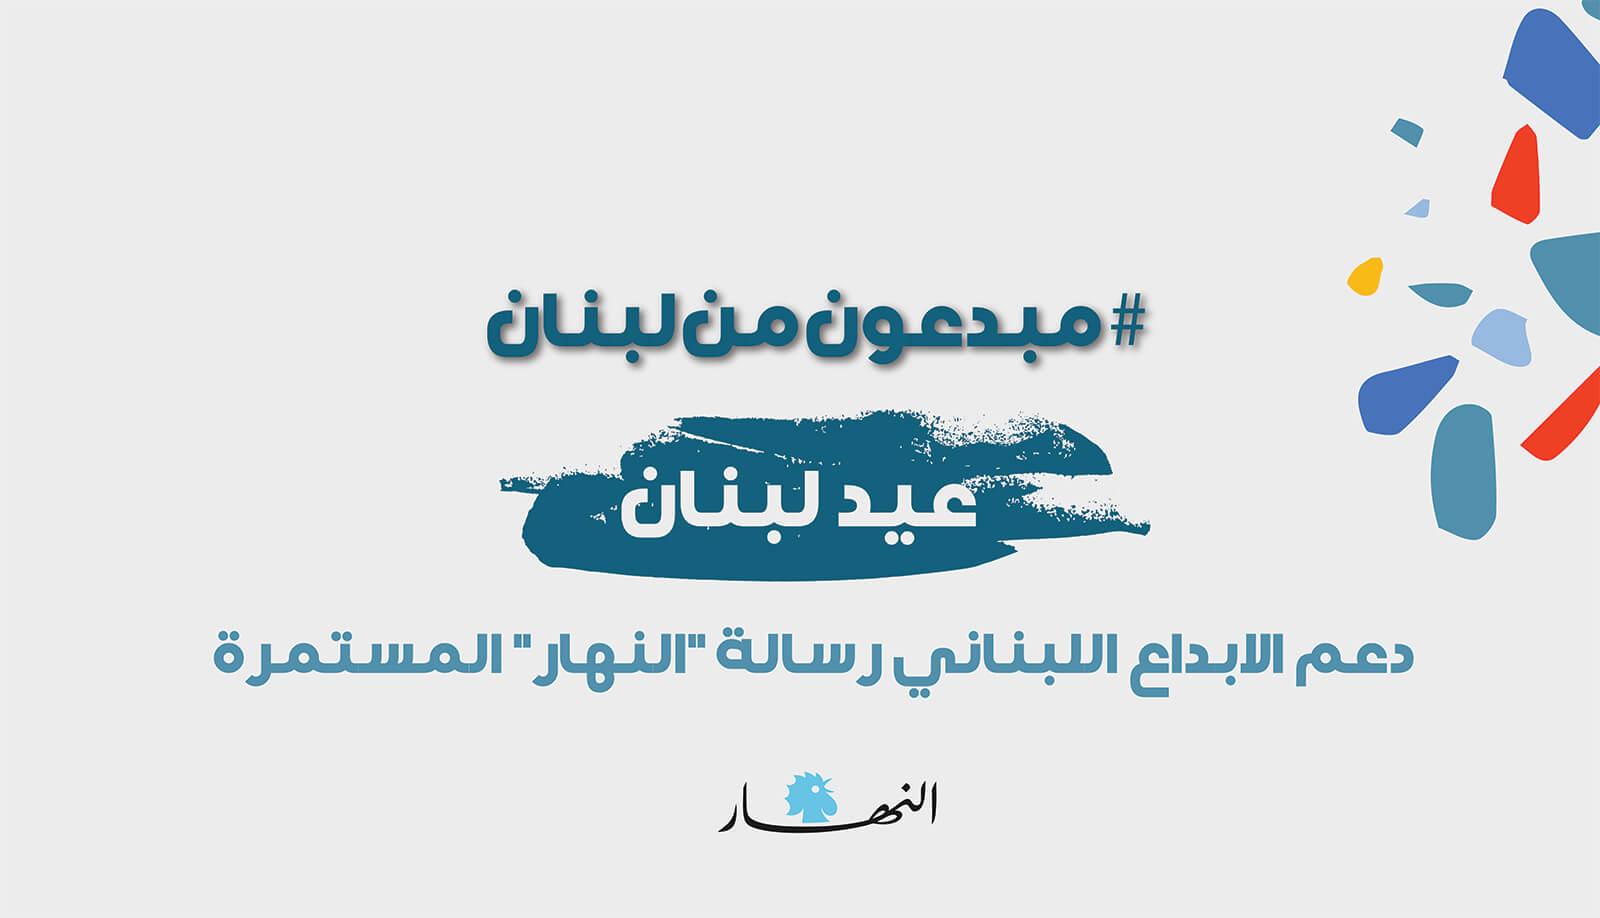 مبدعون من لبنان